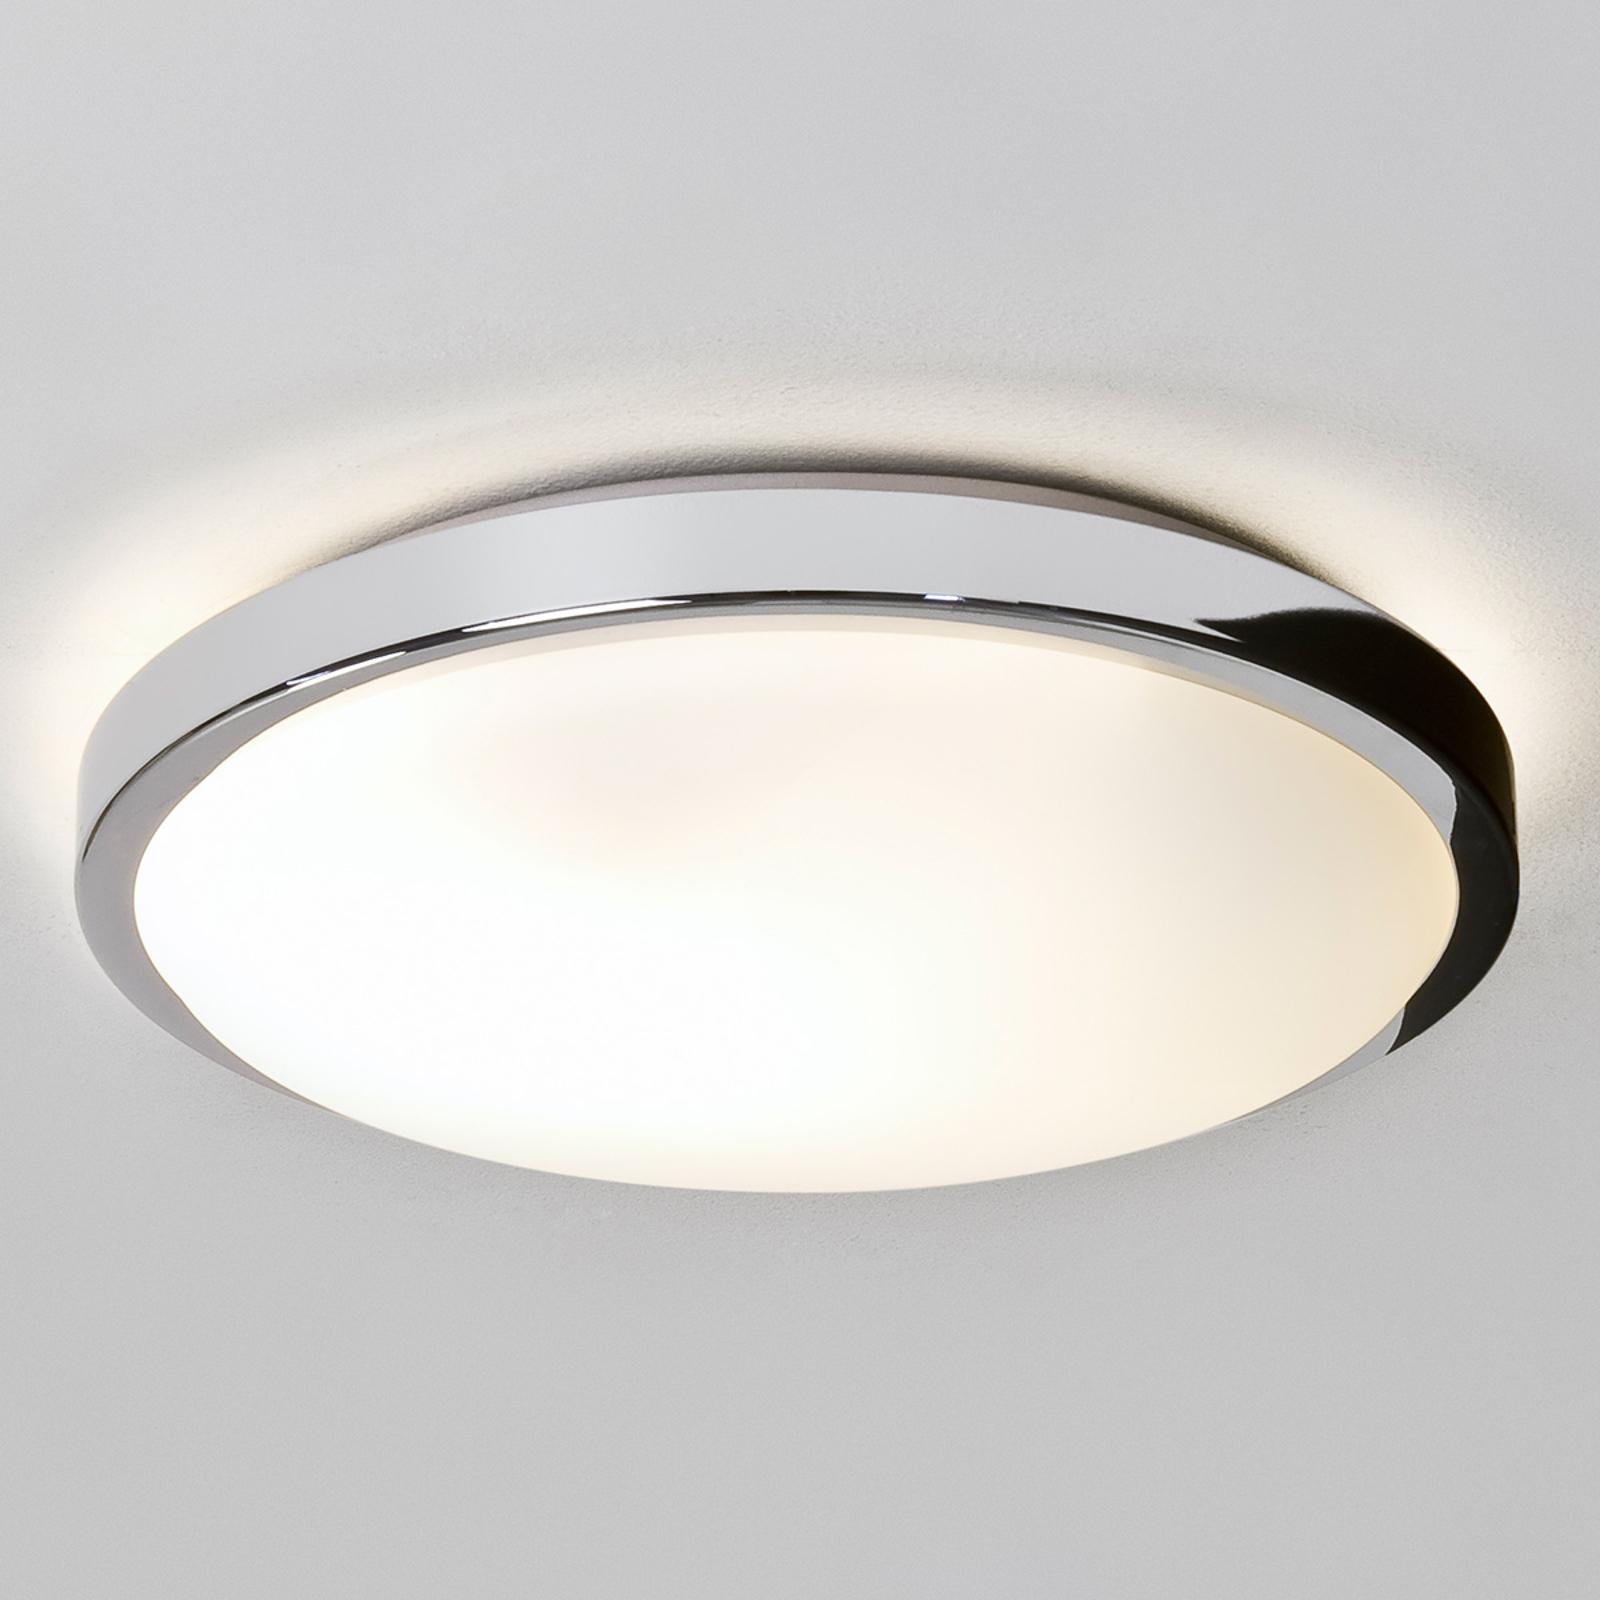 Denia Bathroom Ceiling Light IP44_1020086_1